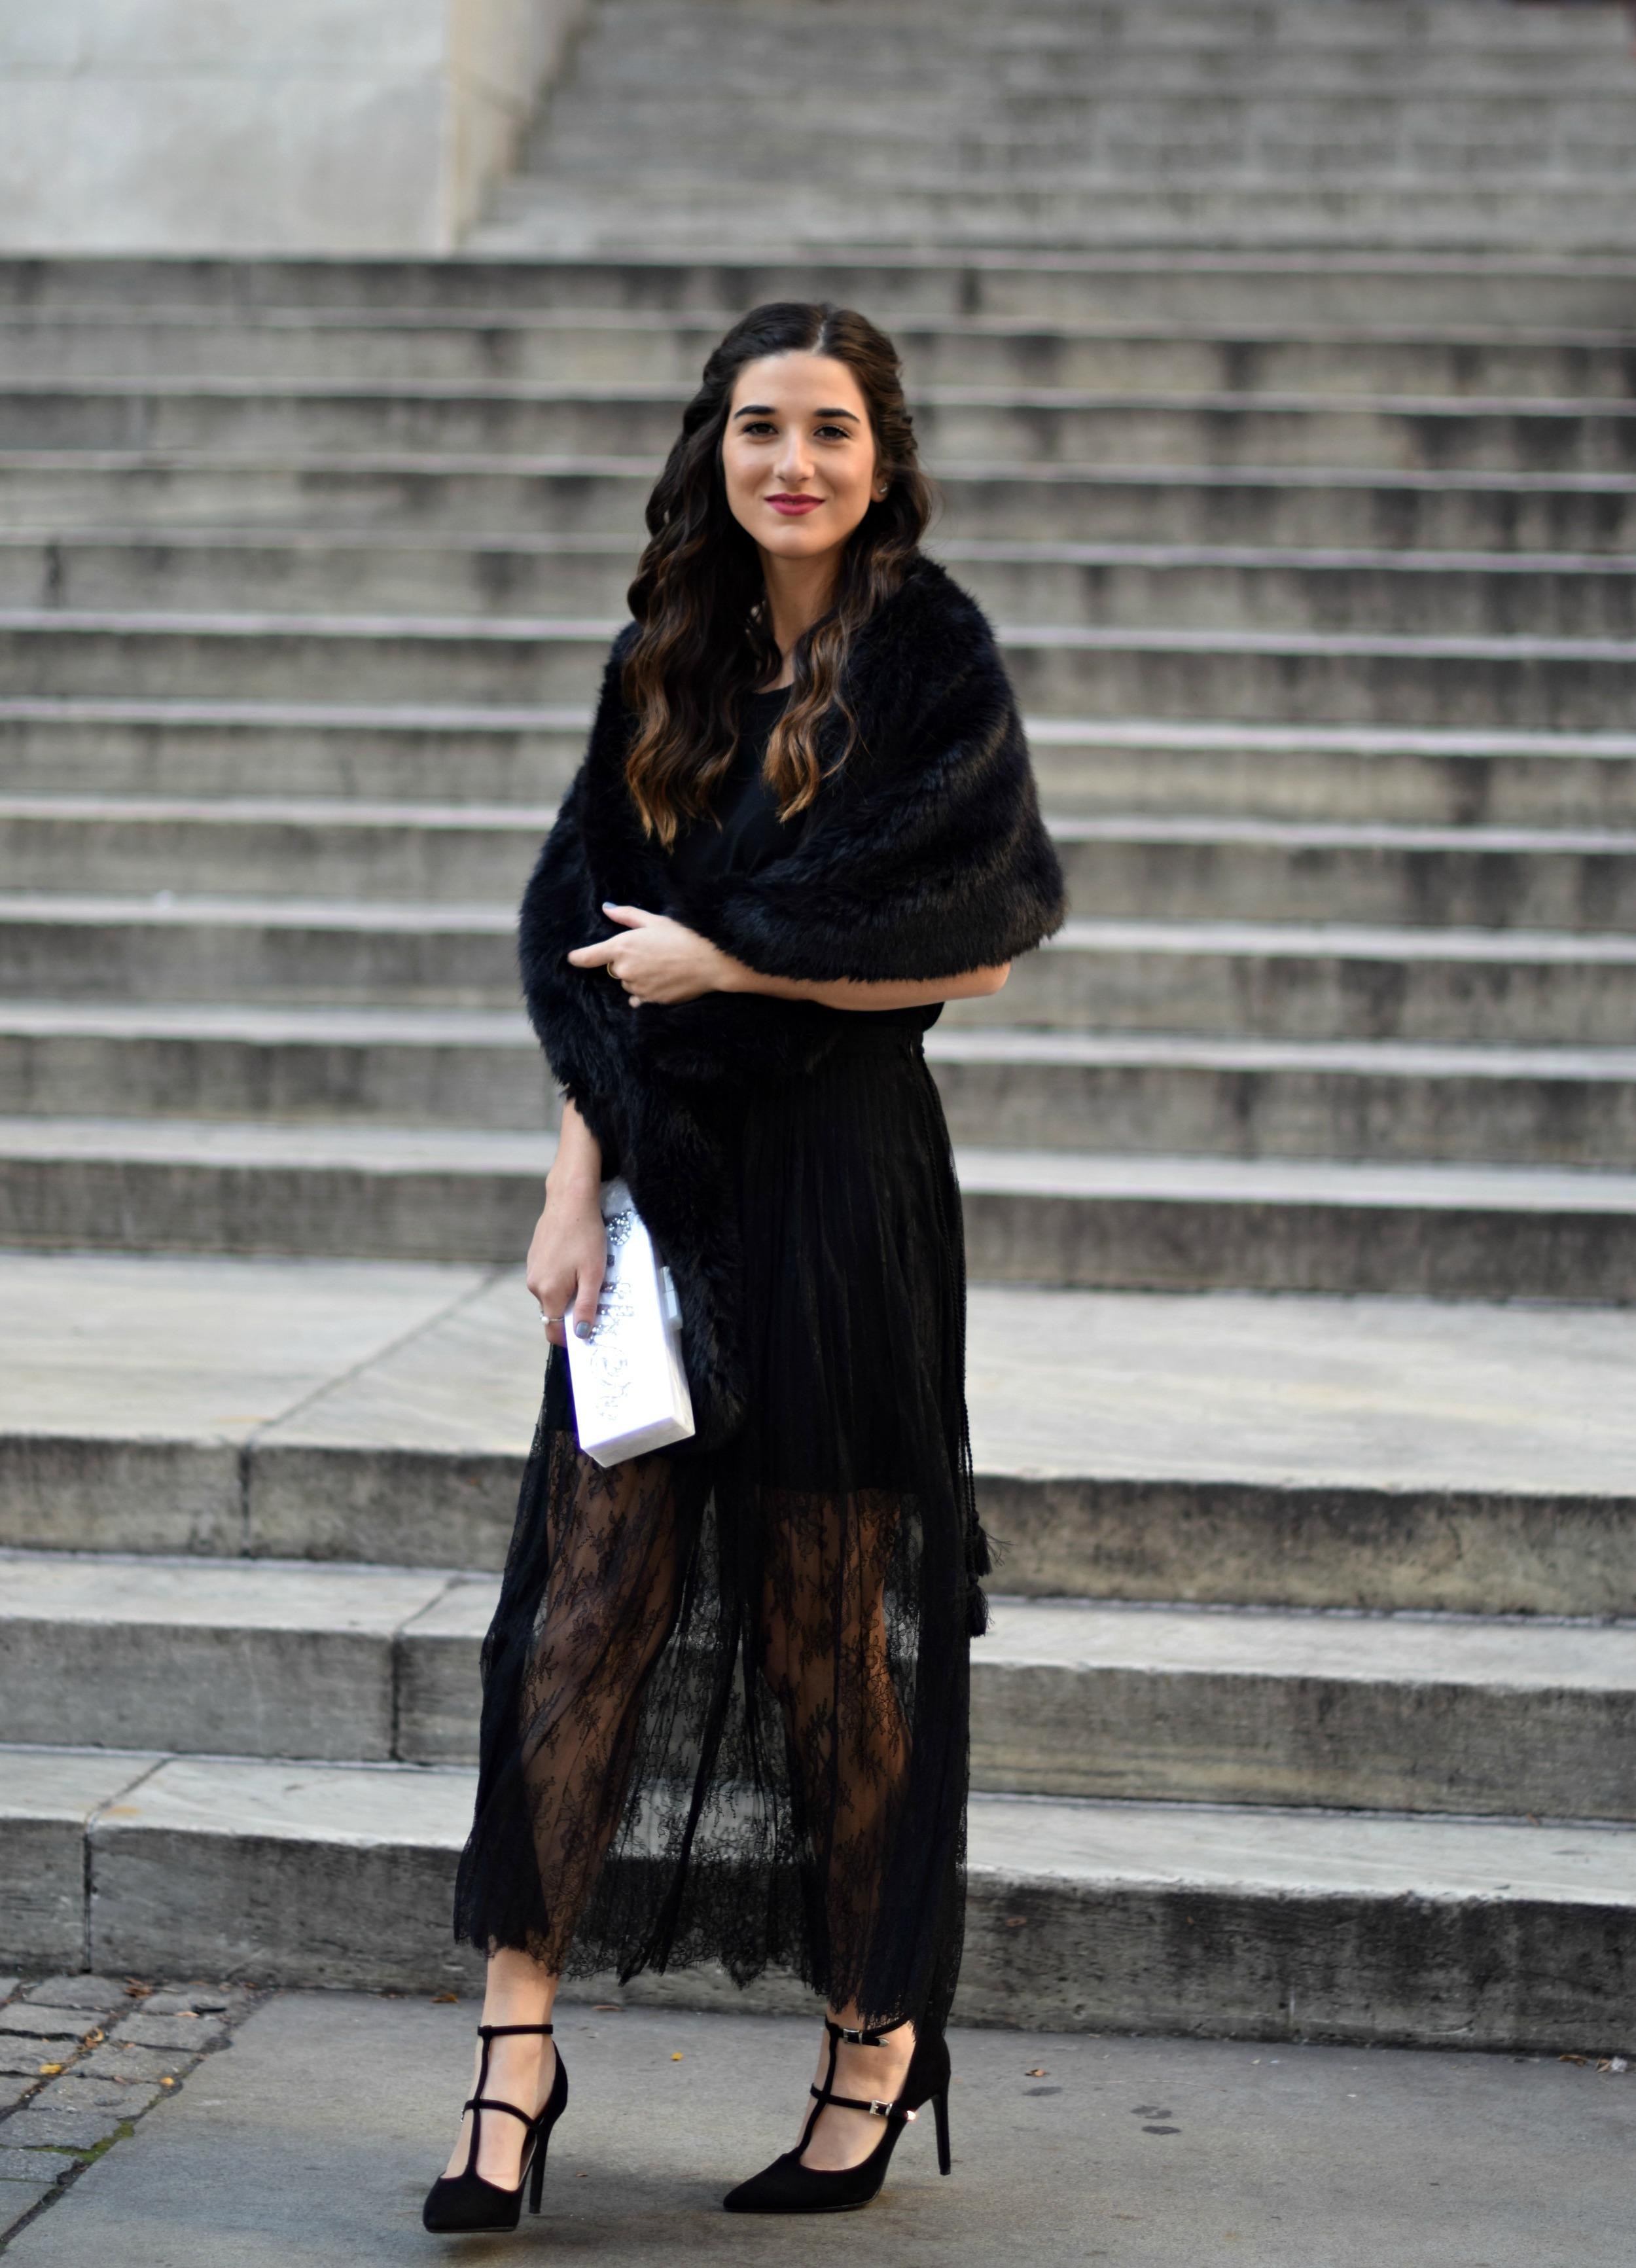 All Black Lace Skirt Fur Stole Louboutins & Love Fashion Blog Esther Santer NYC Street Style Blogger Outfit OOTD Classy Fancy Look Winter Wear Women Girls Monochrome Monogram Clutch Heels Zara Stiletto Beautiful Photoshoot Shoes Shop Inspo Inspiration.jpg